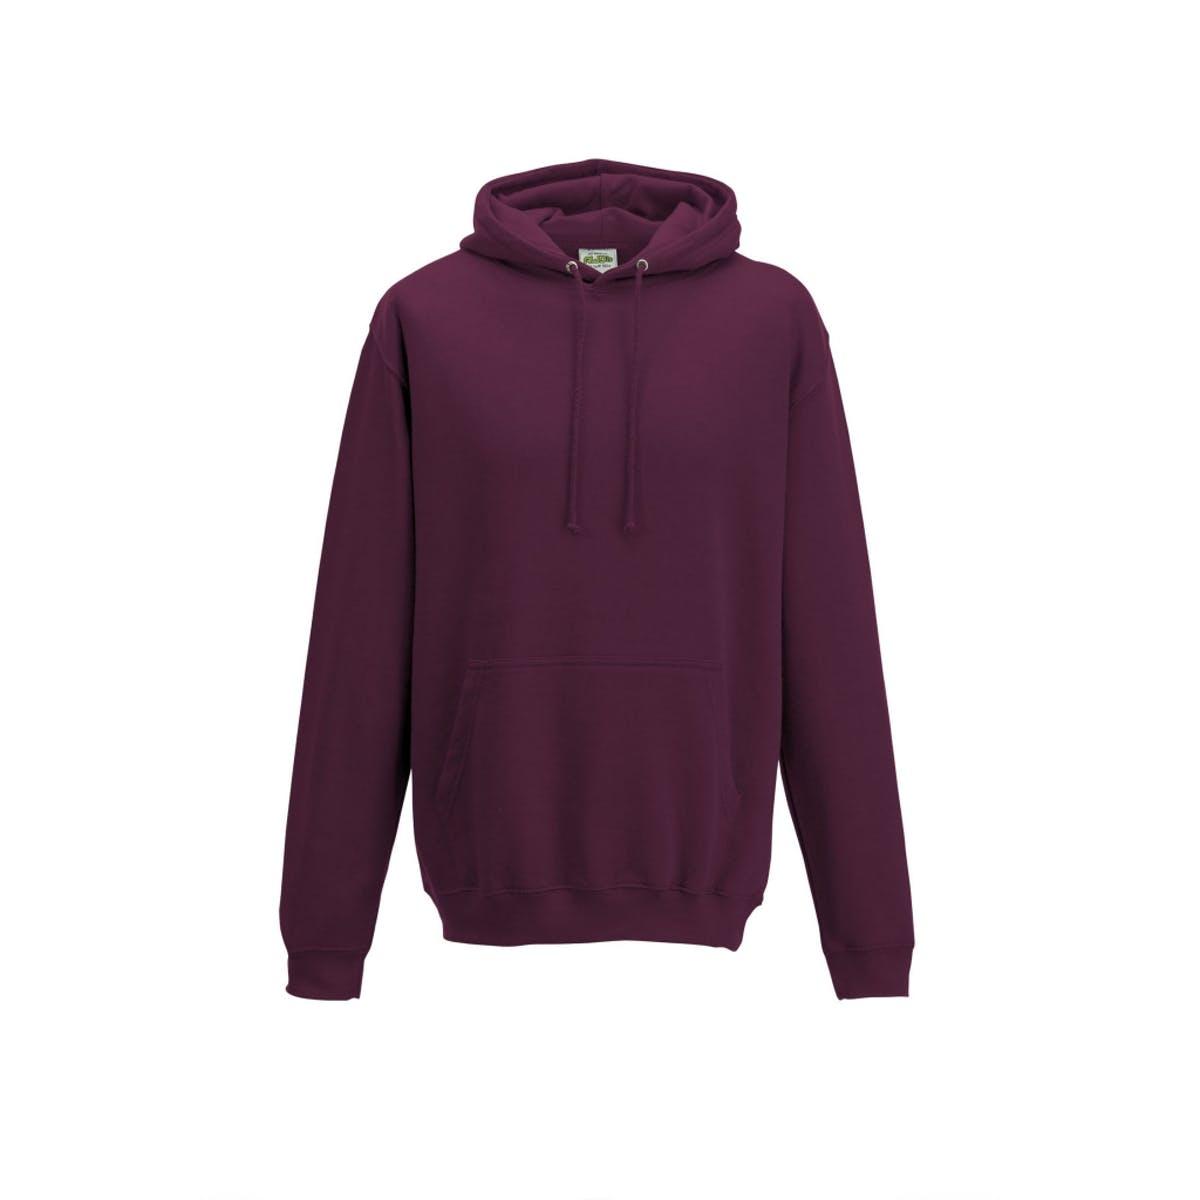 burgundy overhead college hoodies